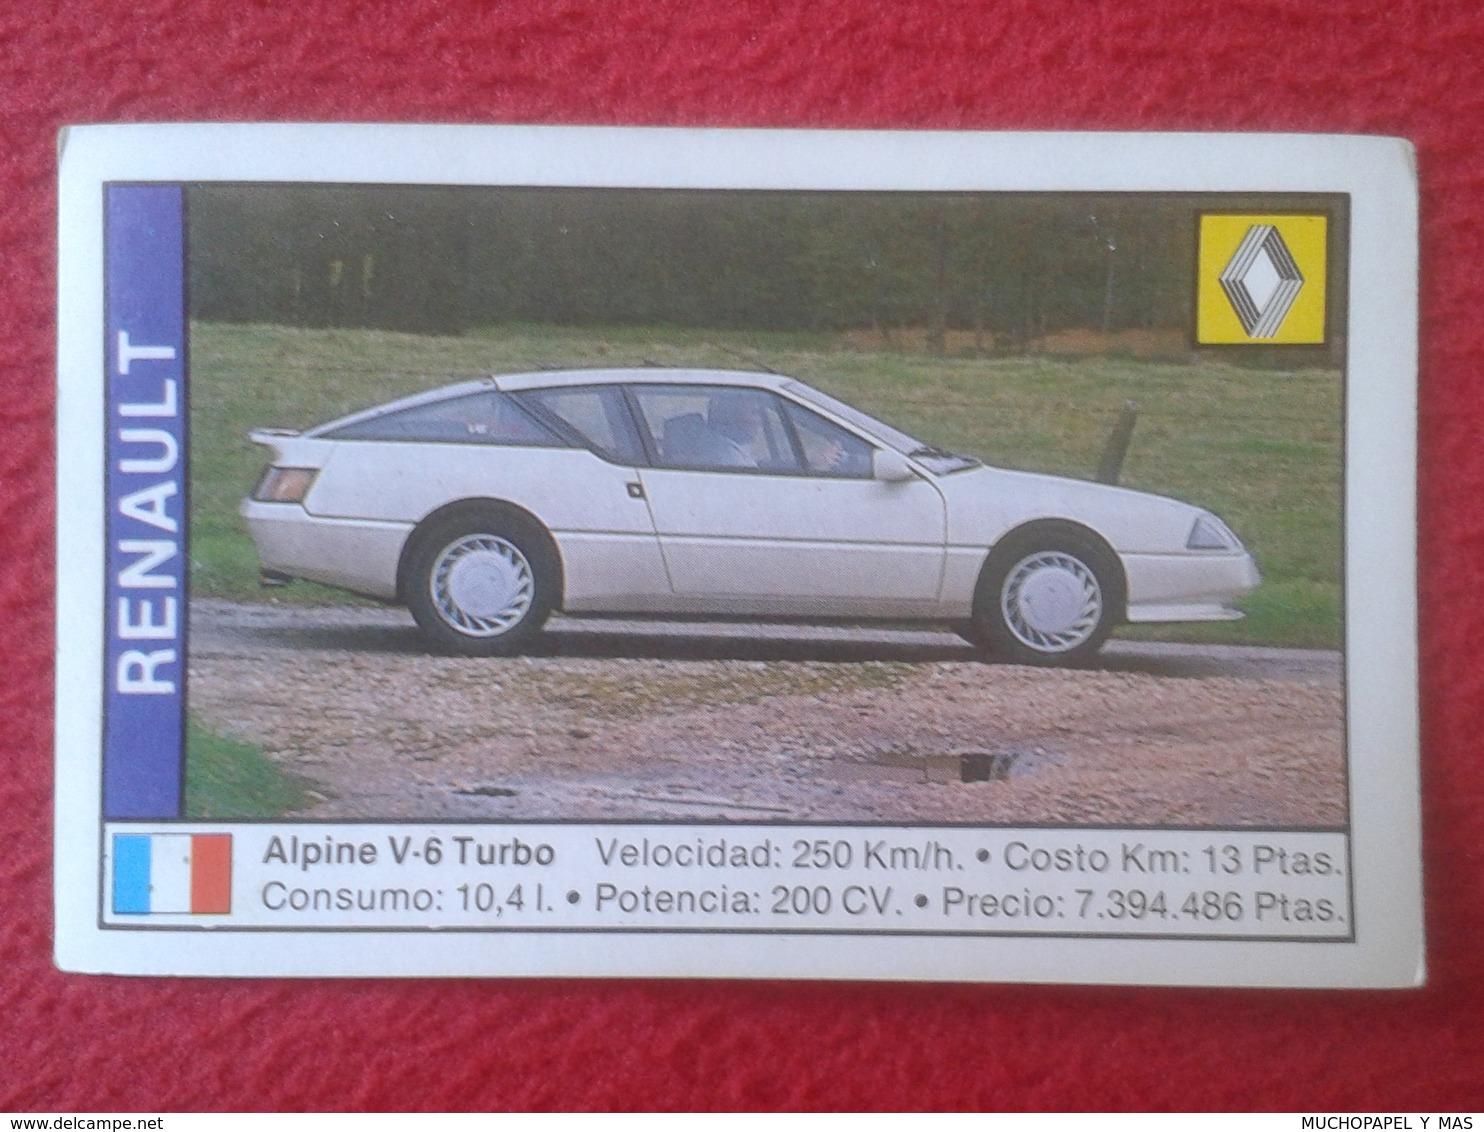 SPAIN ESPAGNE. ANTIGUO OLD CROMO ESTAMPA 1988 COCHES 89 COCHE CAR CARS AUTO AUTOMÓVIL RENAULT ALPINE V-6 TURBO FRANCIA - Cromos